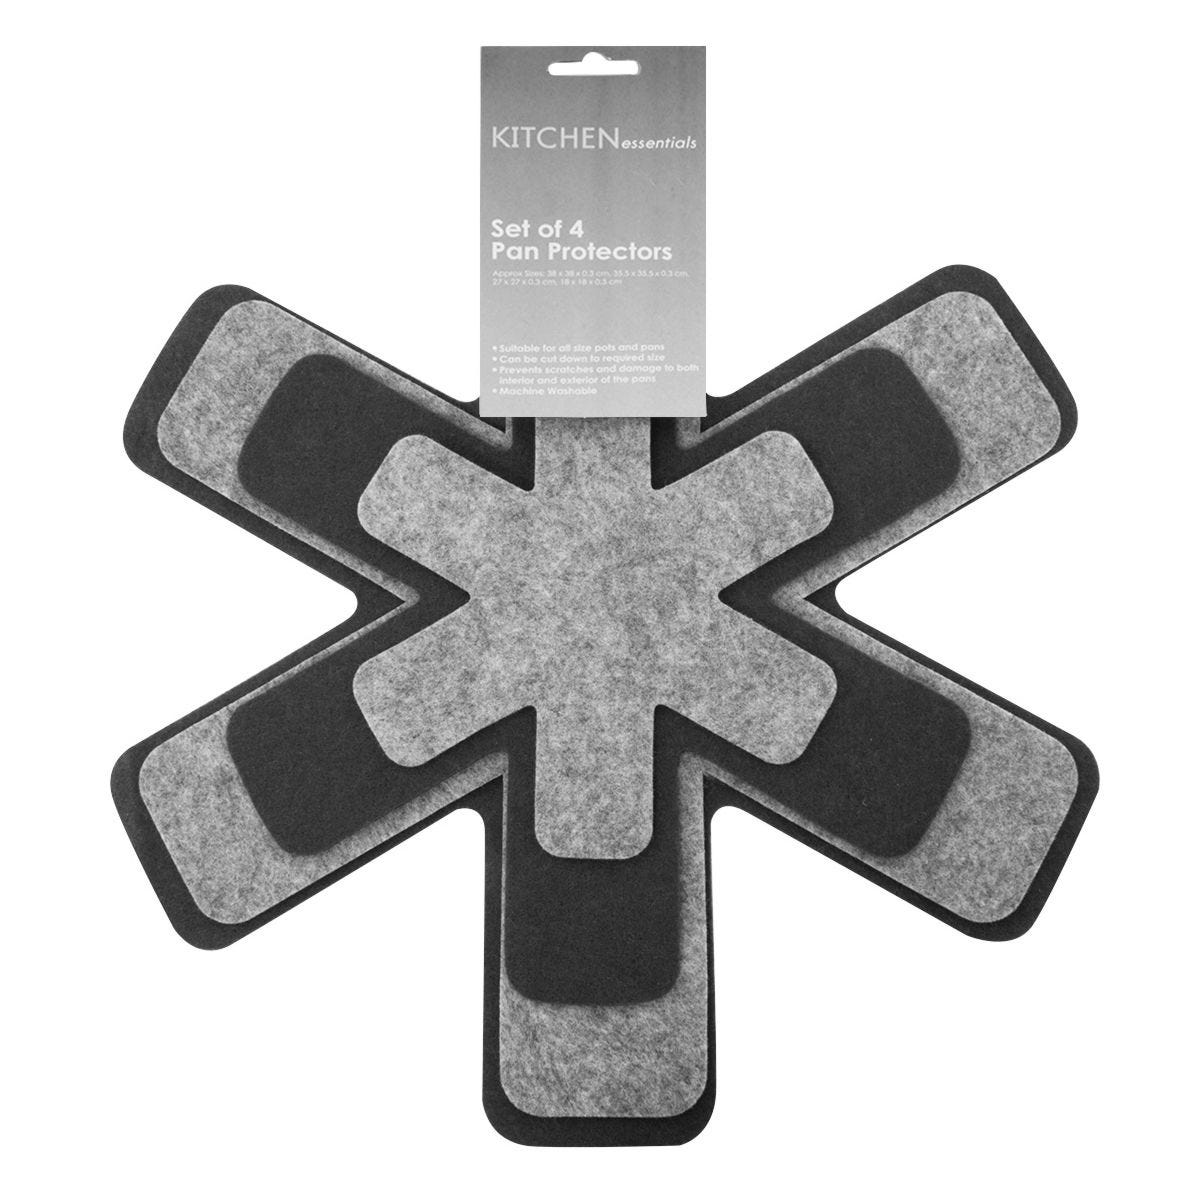 Kitchen Essentials Pan Protectors - Set of 4